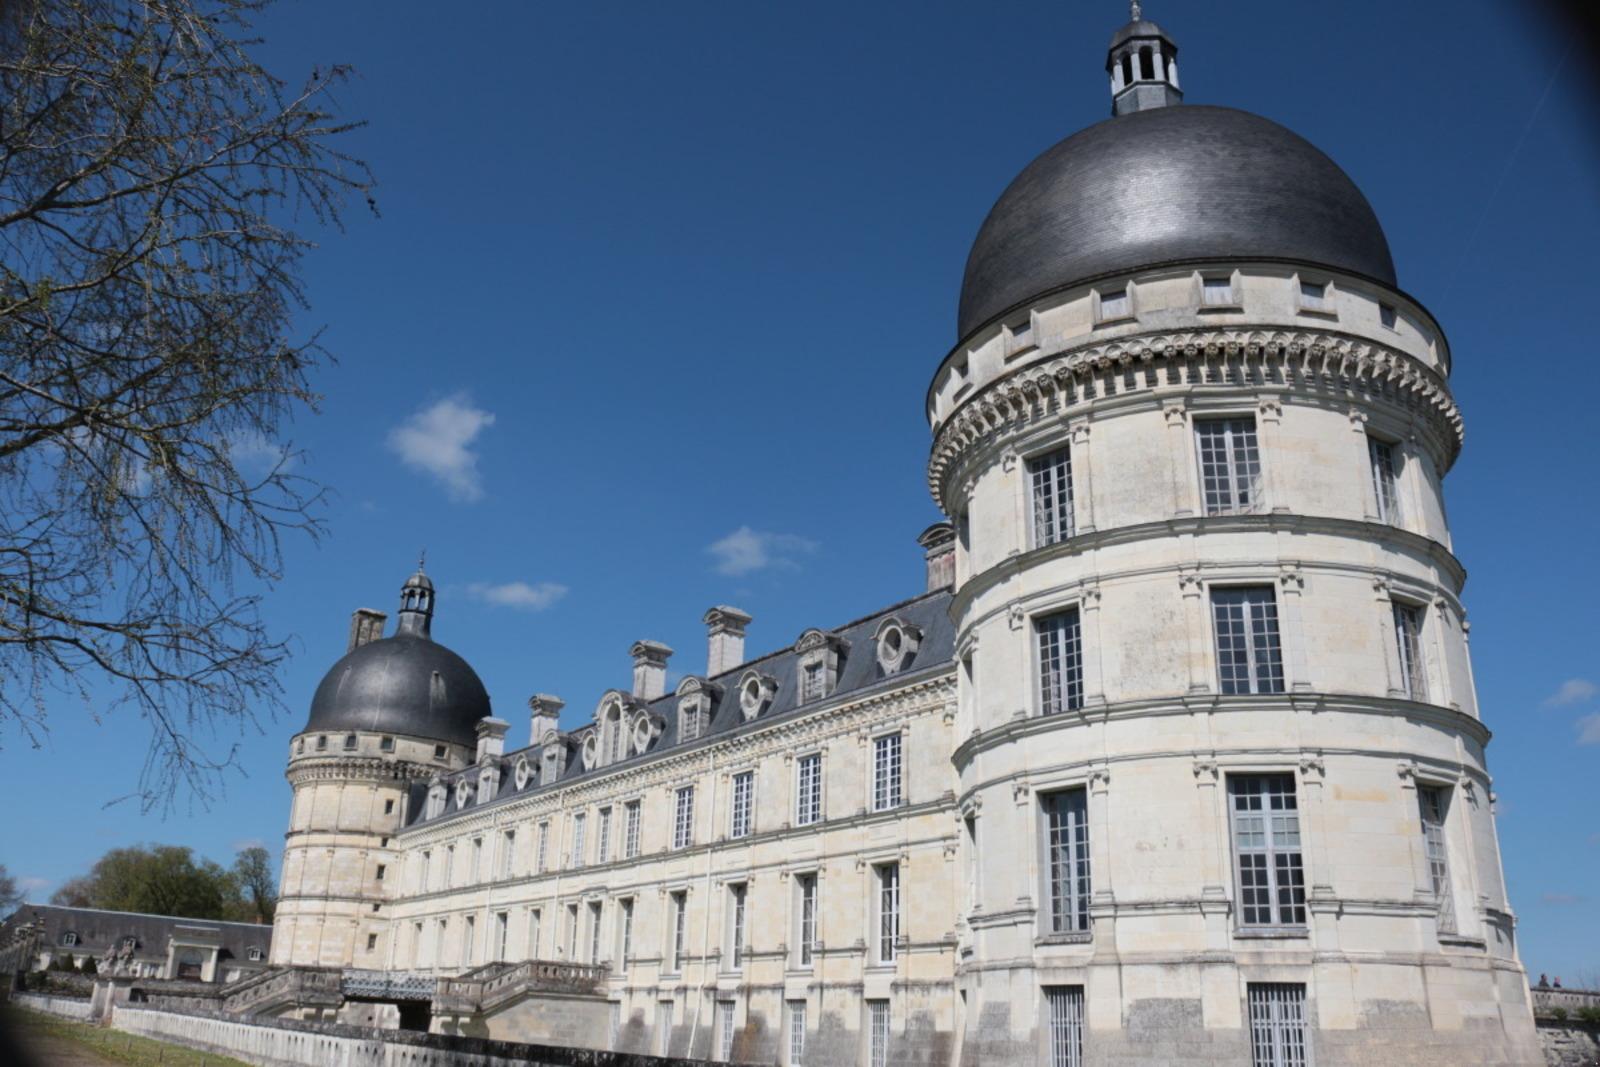 façade_château_valencay_berryprovince©ADTI